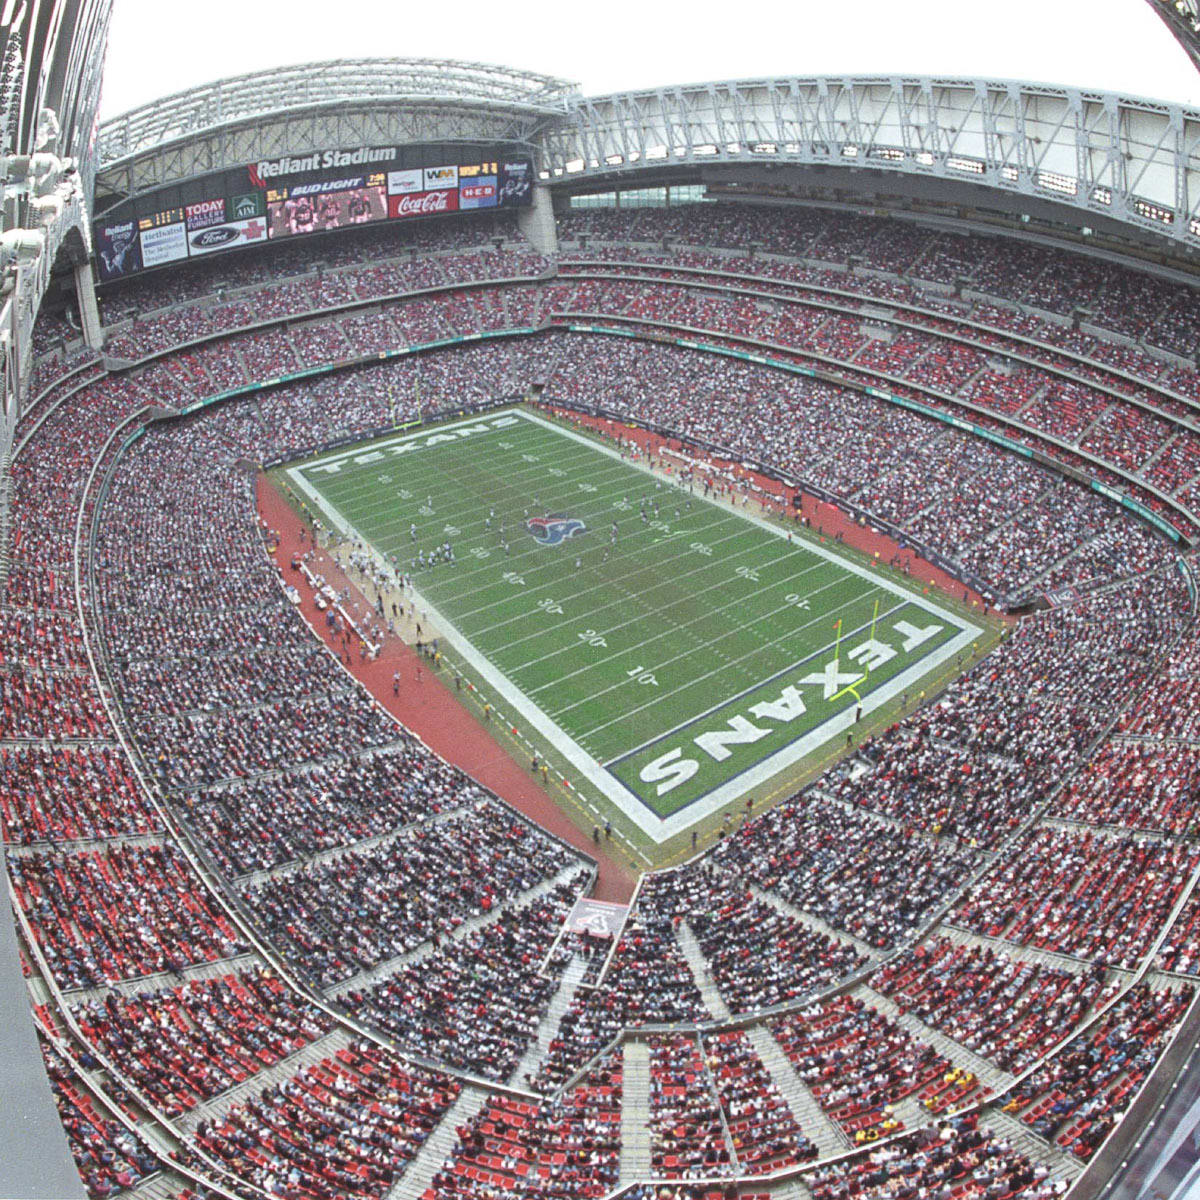 News_Reliant_stadium_Houston_Texans_football